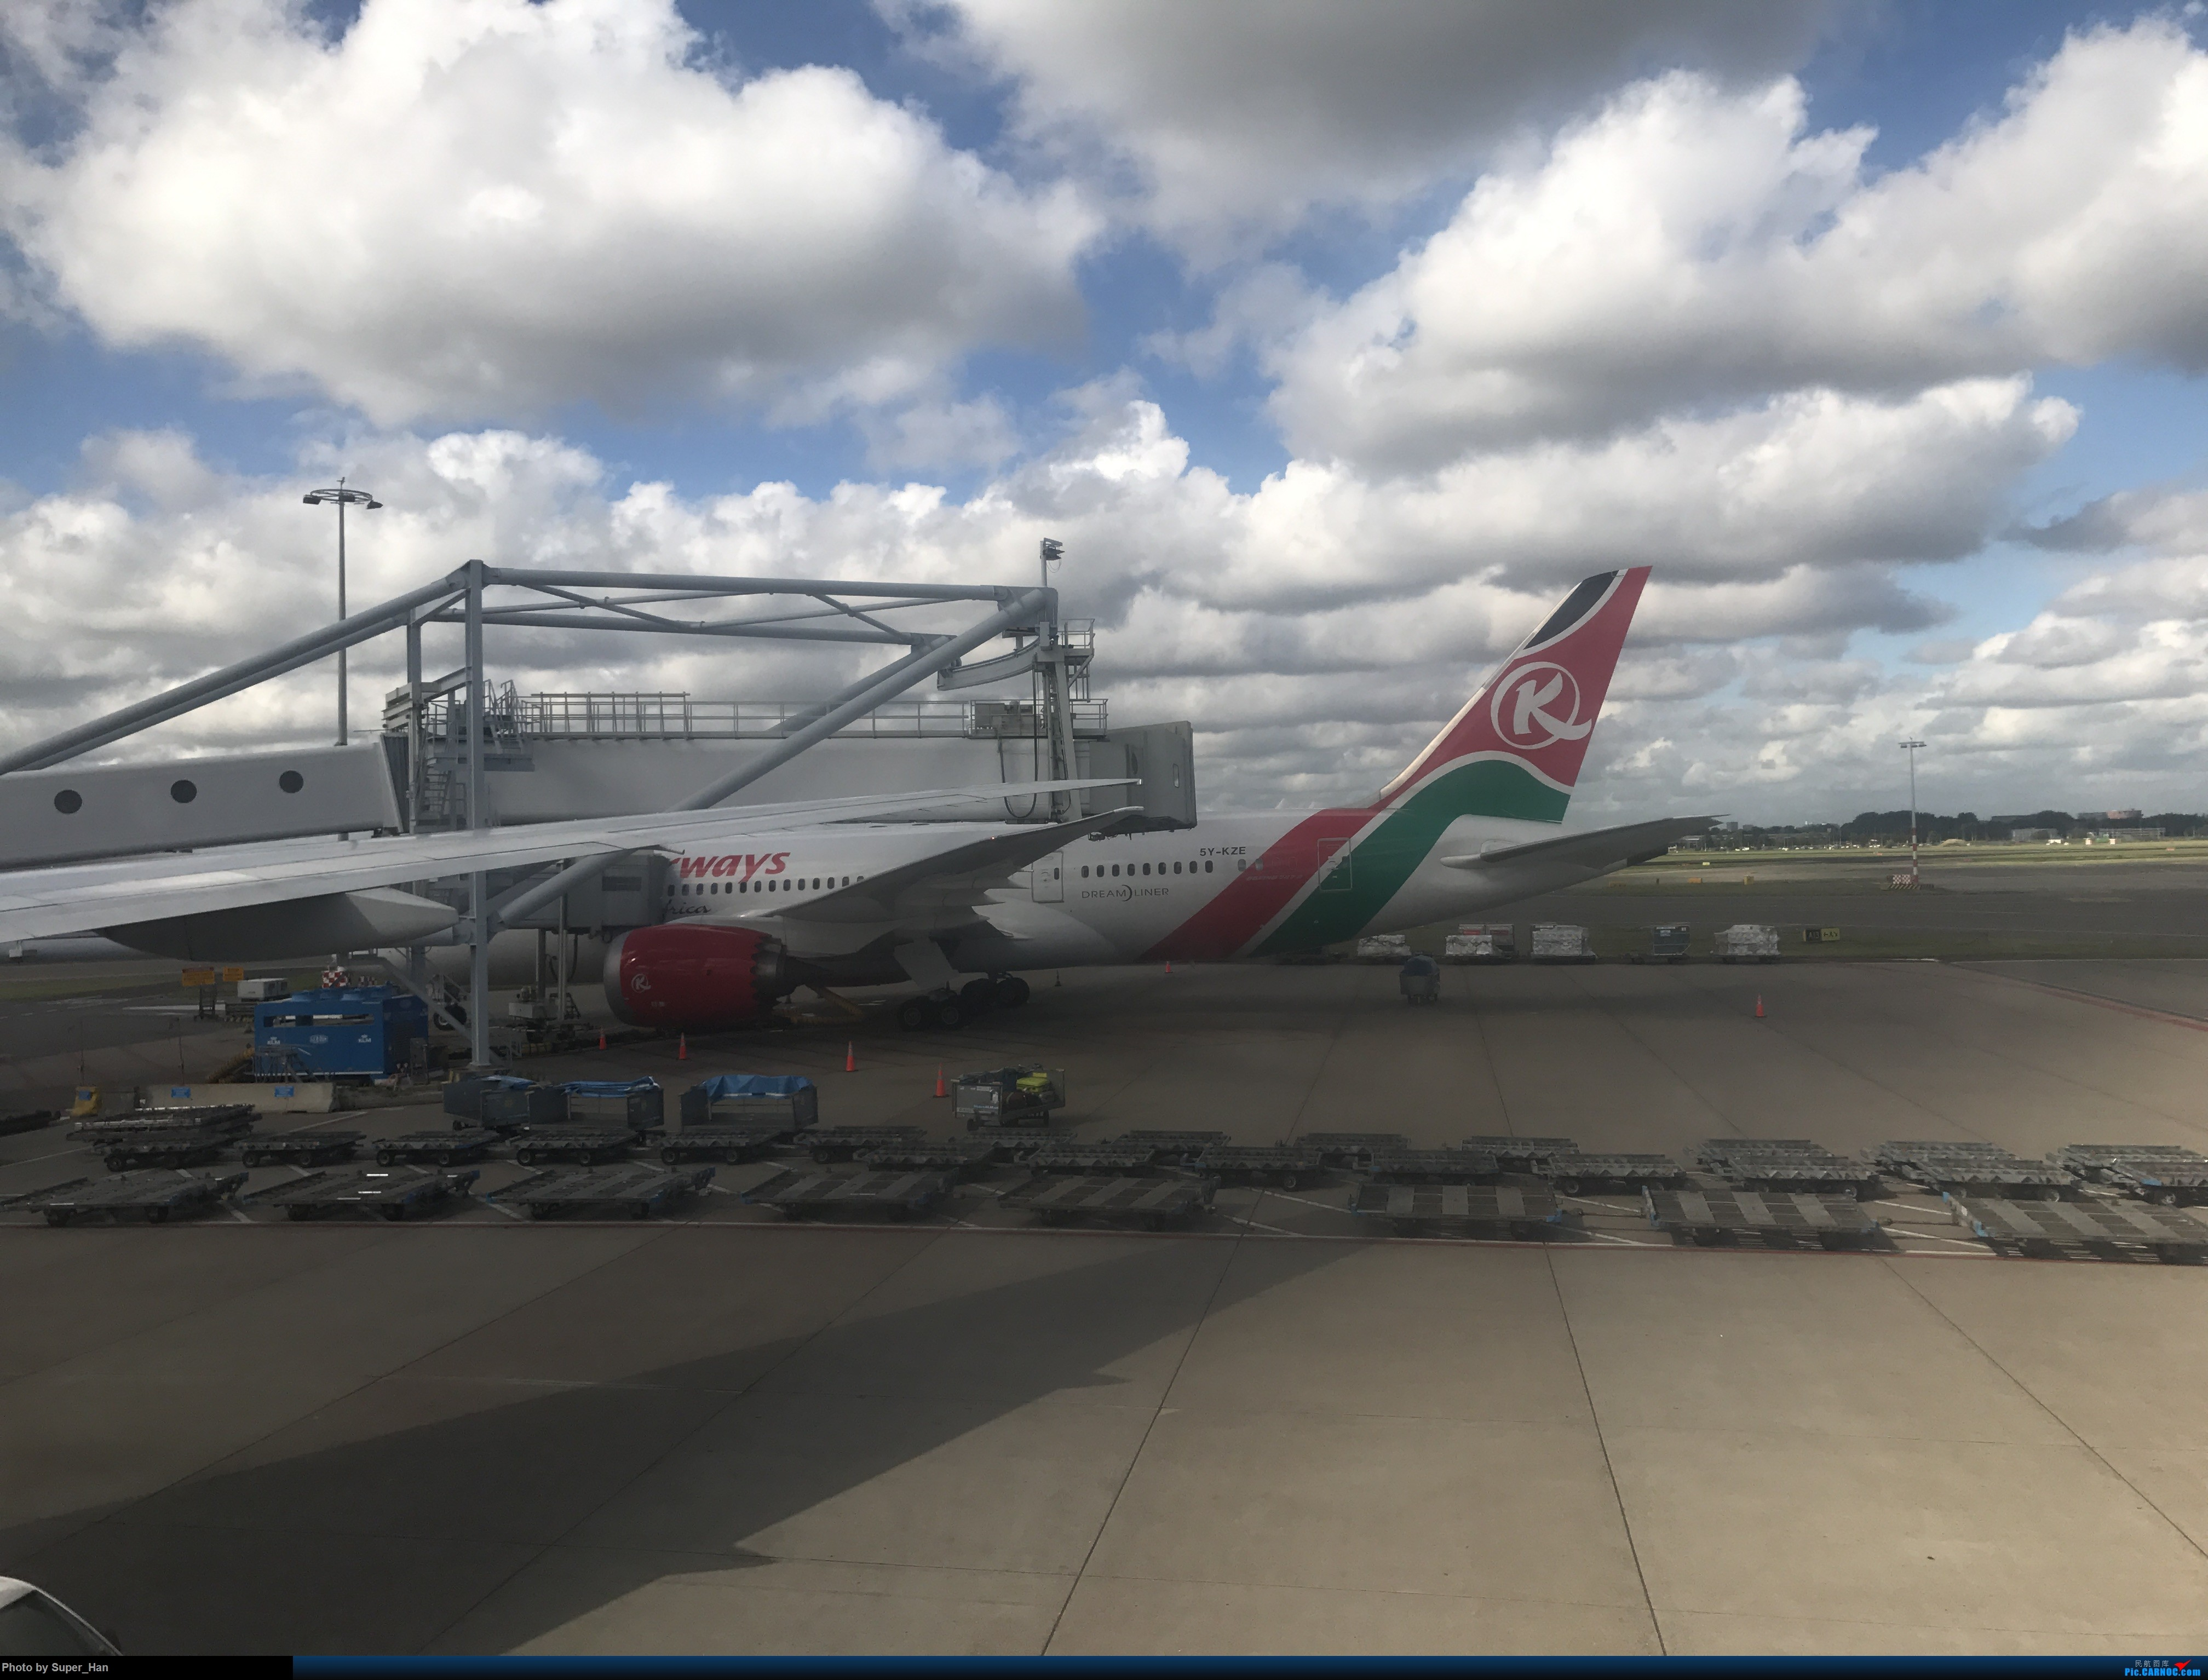 Re:[原创]PVG-AMS 第一次走进阿姆斯特丹史基浦机场! BOEING 787-9 5Y-KZE 荷兰阿姆斯特丹史基浦机场